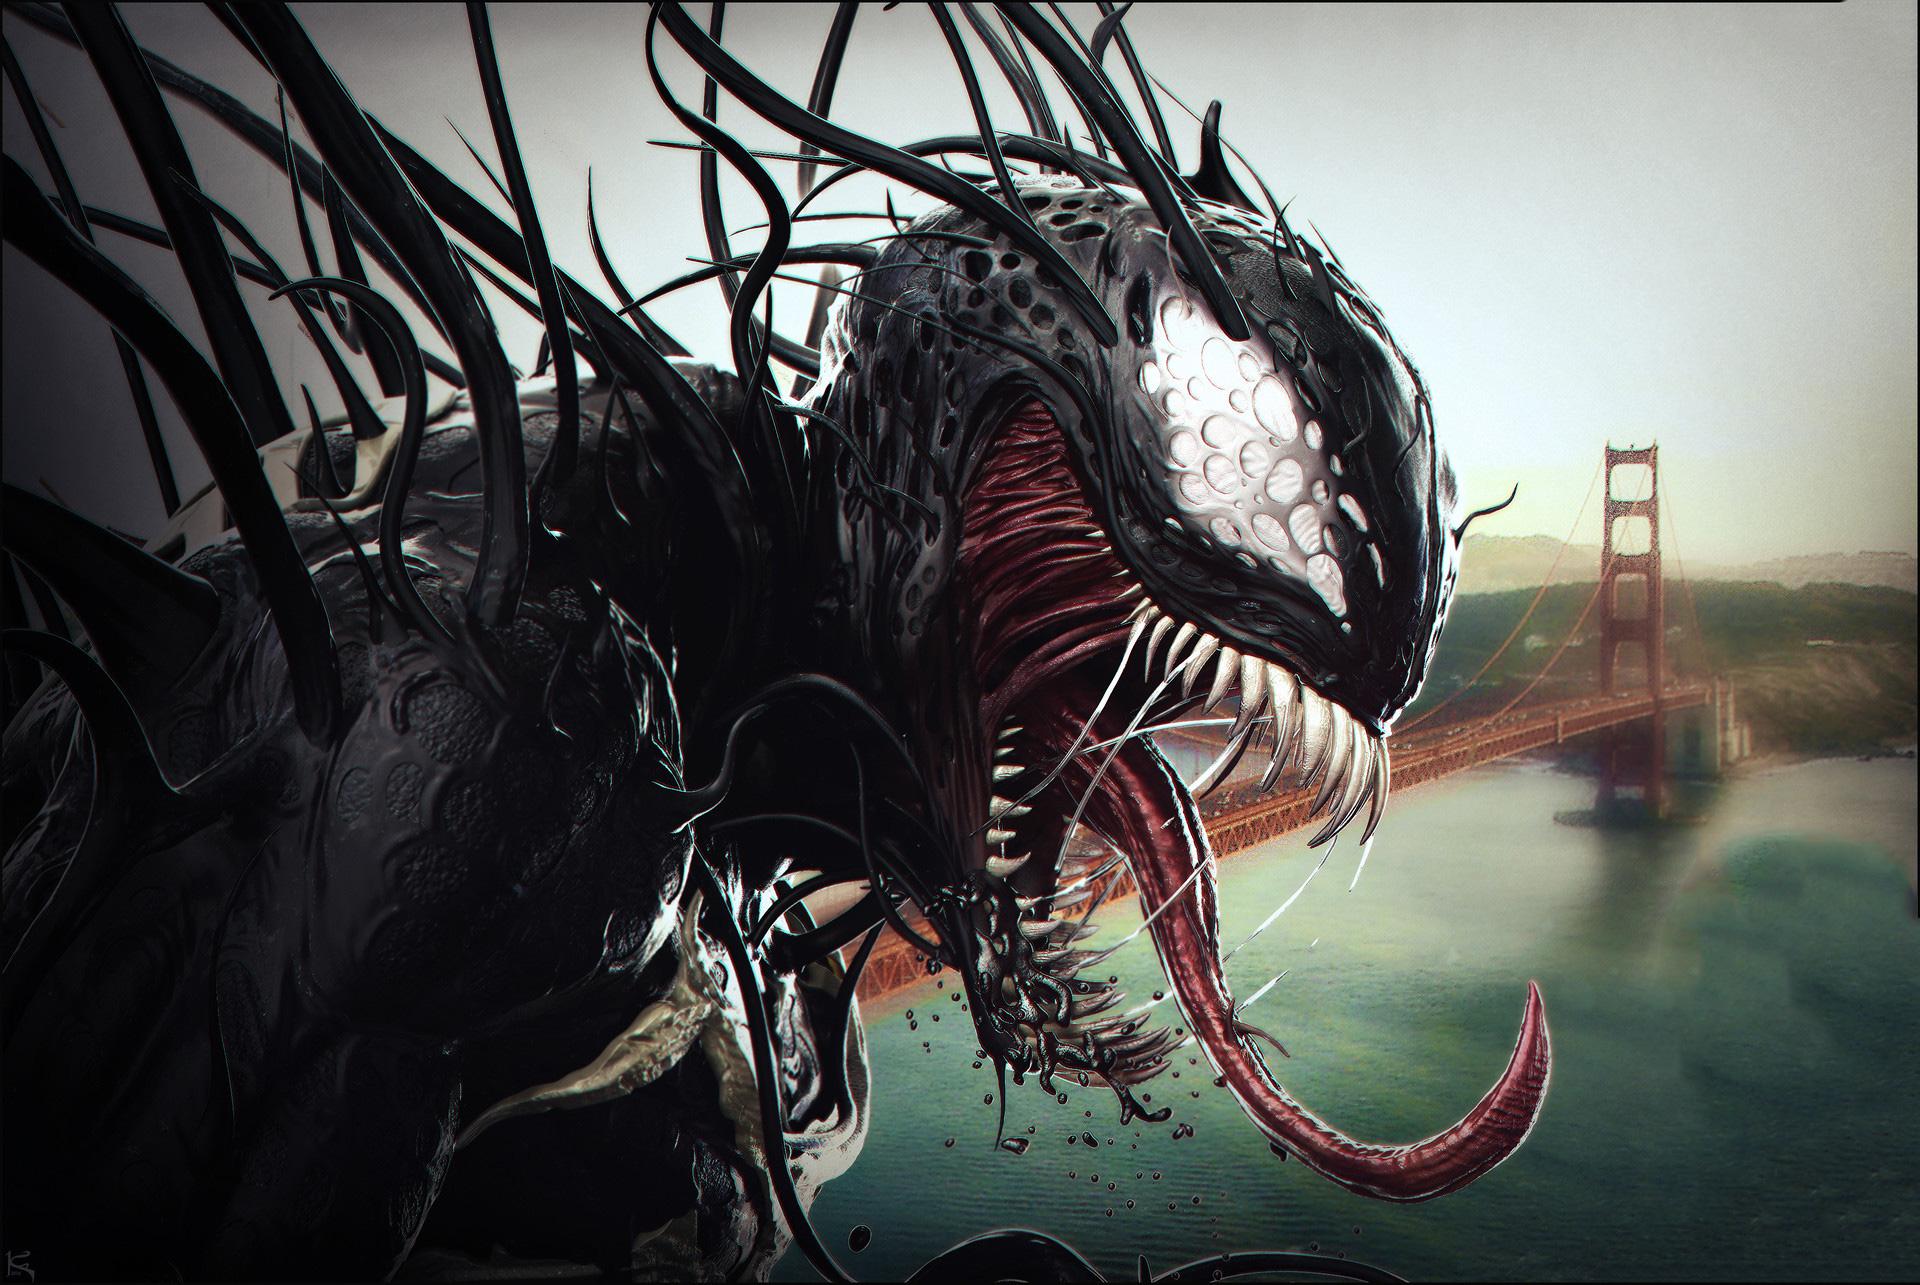 2160x3840 venom in the city sony xperia x xz z5 premium hd - Art wallpaper 2160x3840 ...